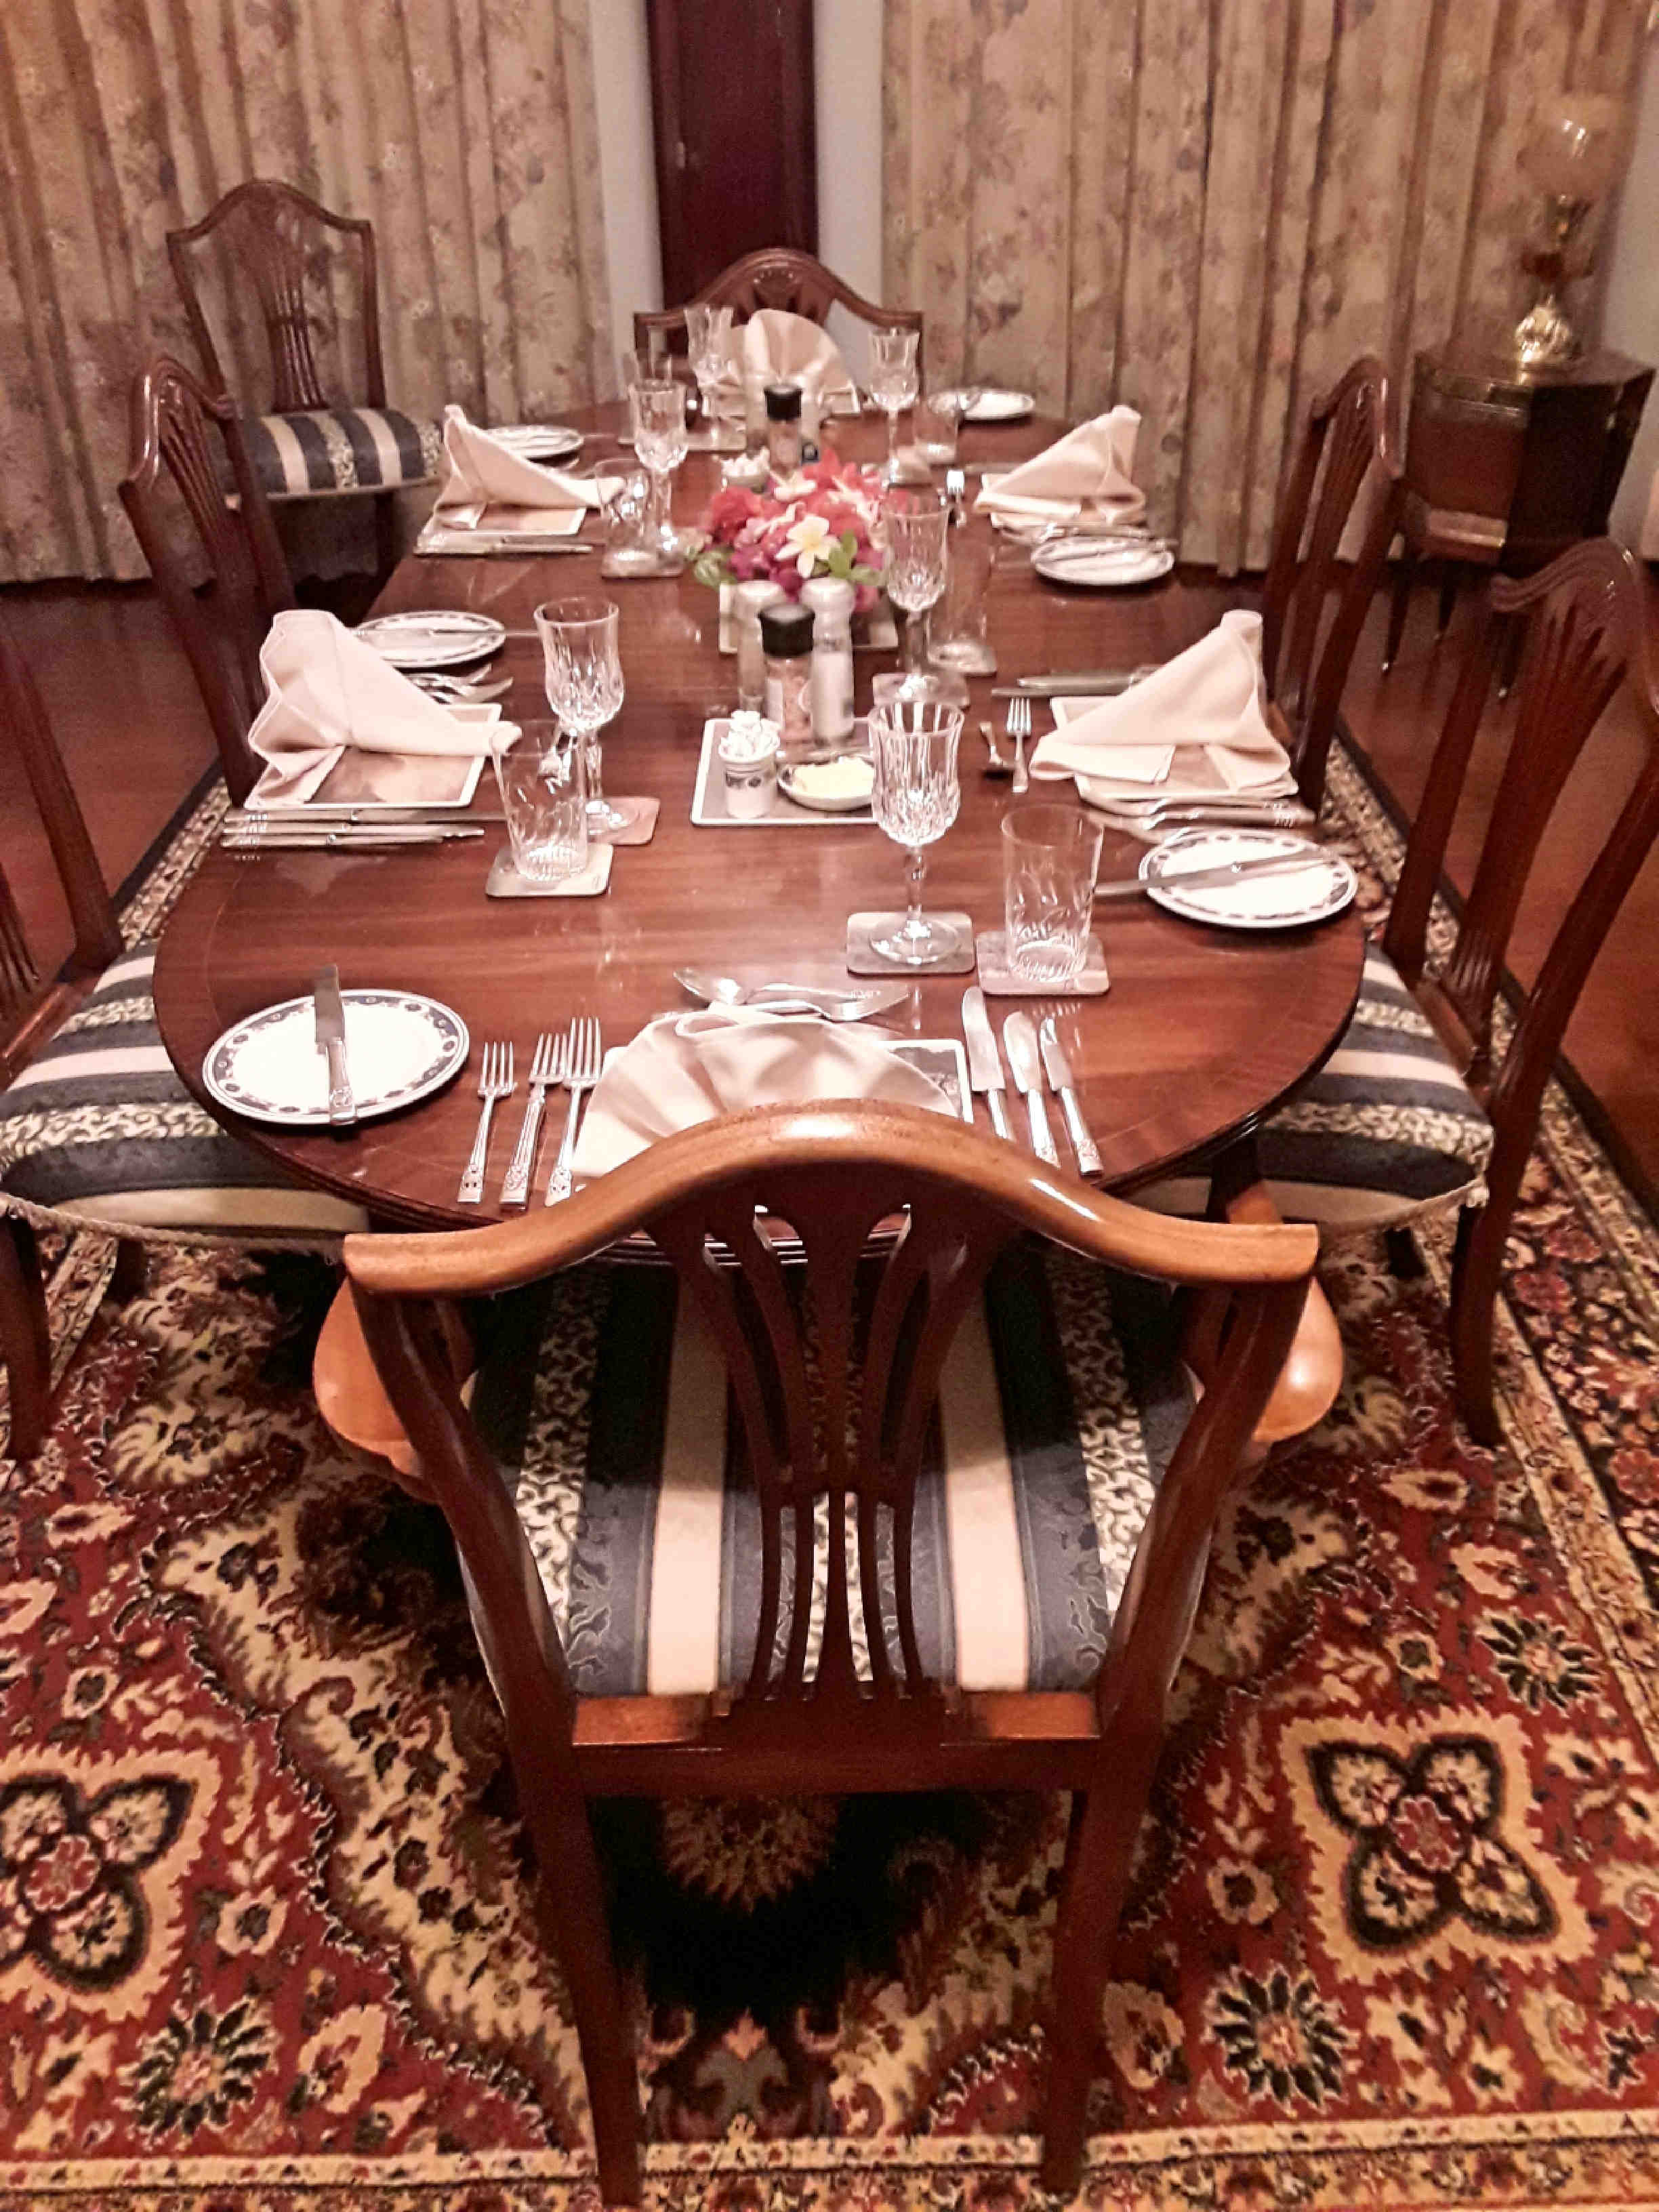 Farm Lodge - Dining Room